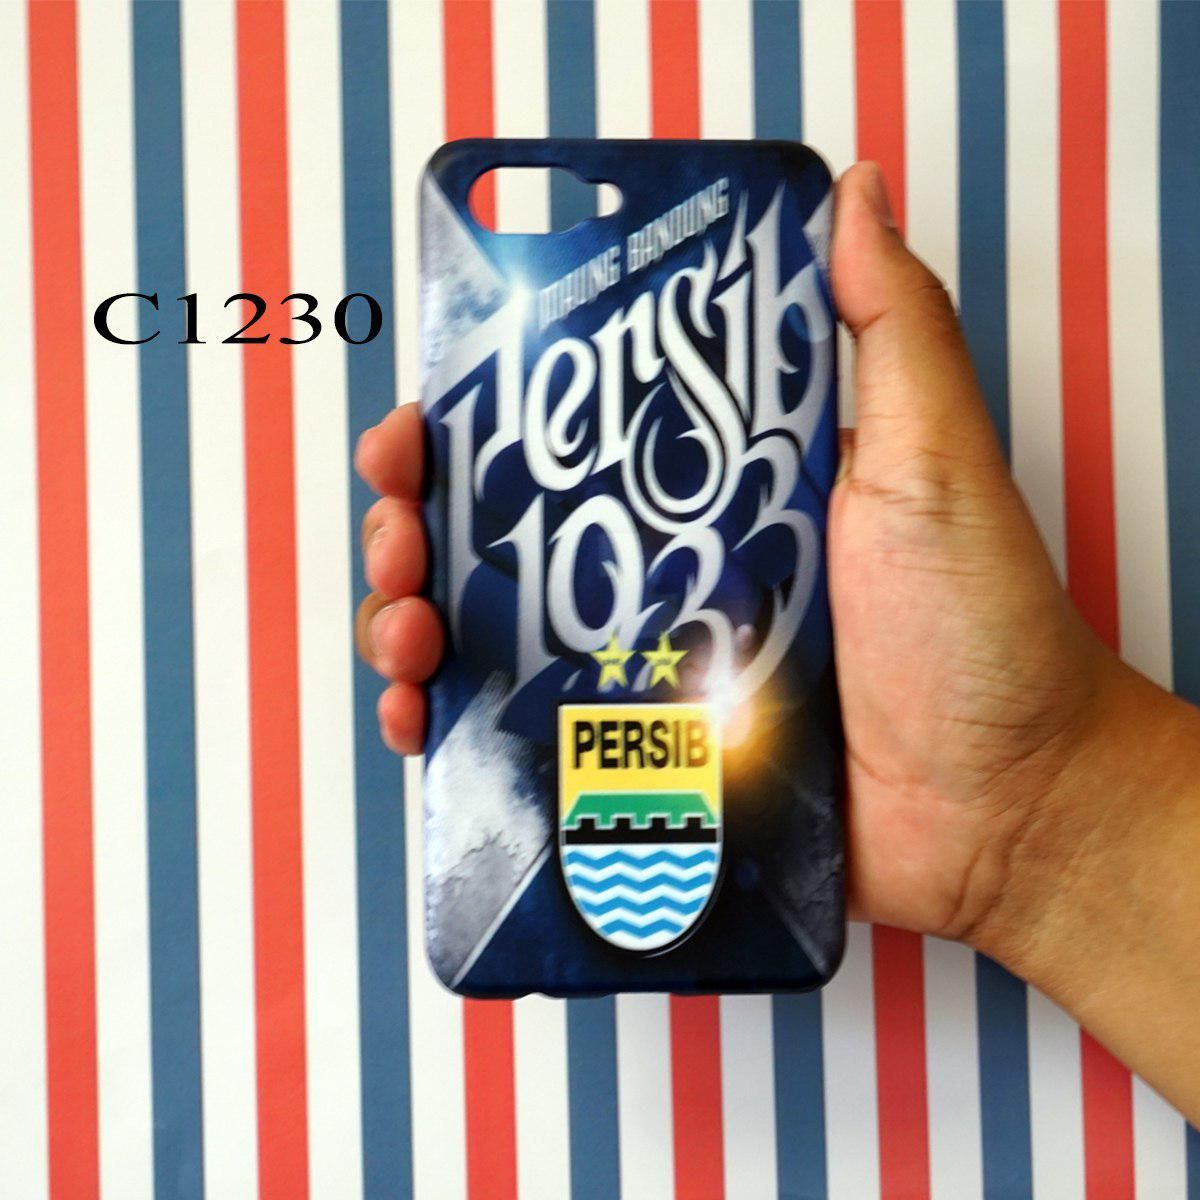 Smartphone Custom Case C1230 Iphone Case Smartphone